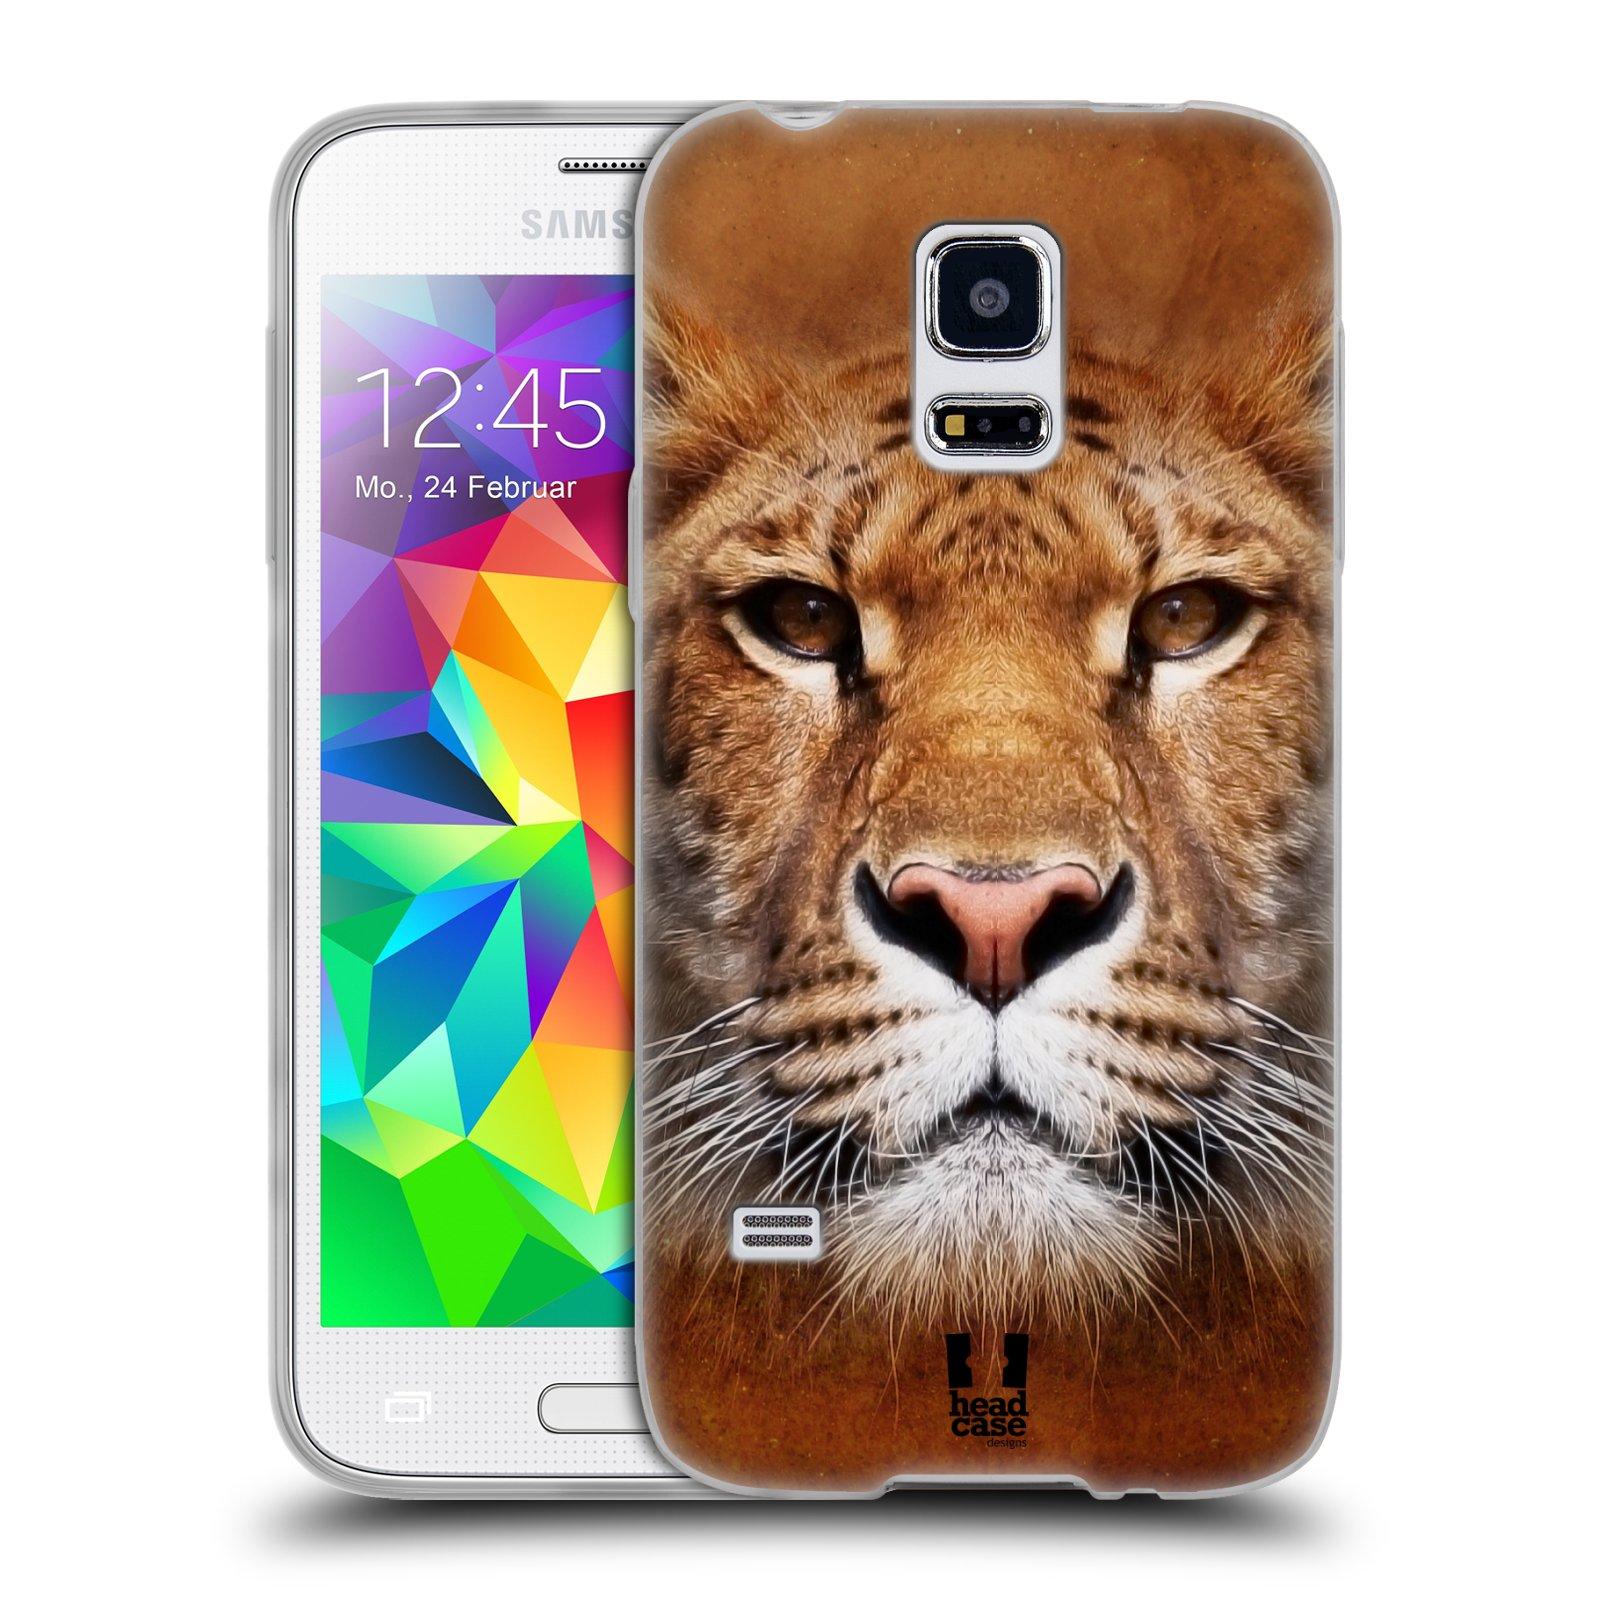 HEAD CASE silikonový obal na mobil Samsung Galaxy S5 MINI vzor Zvířecí tváře Sibiřský tygr